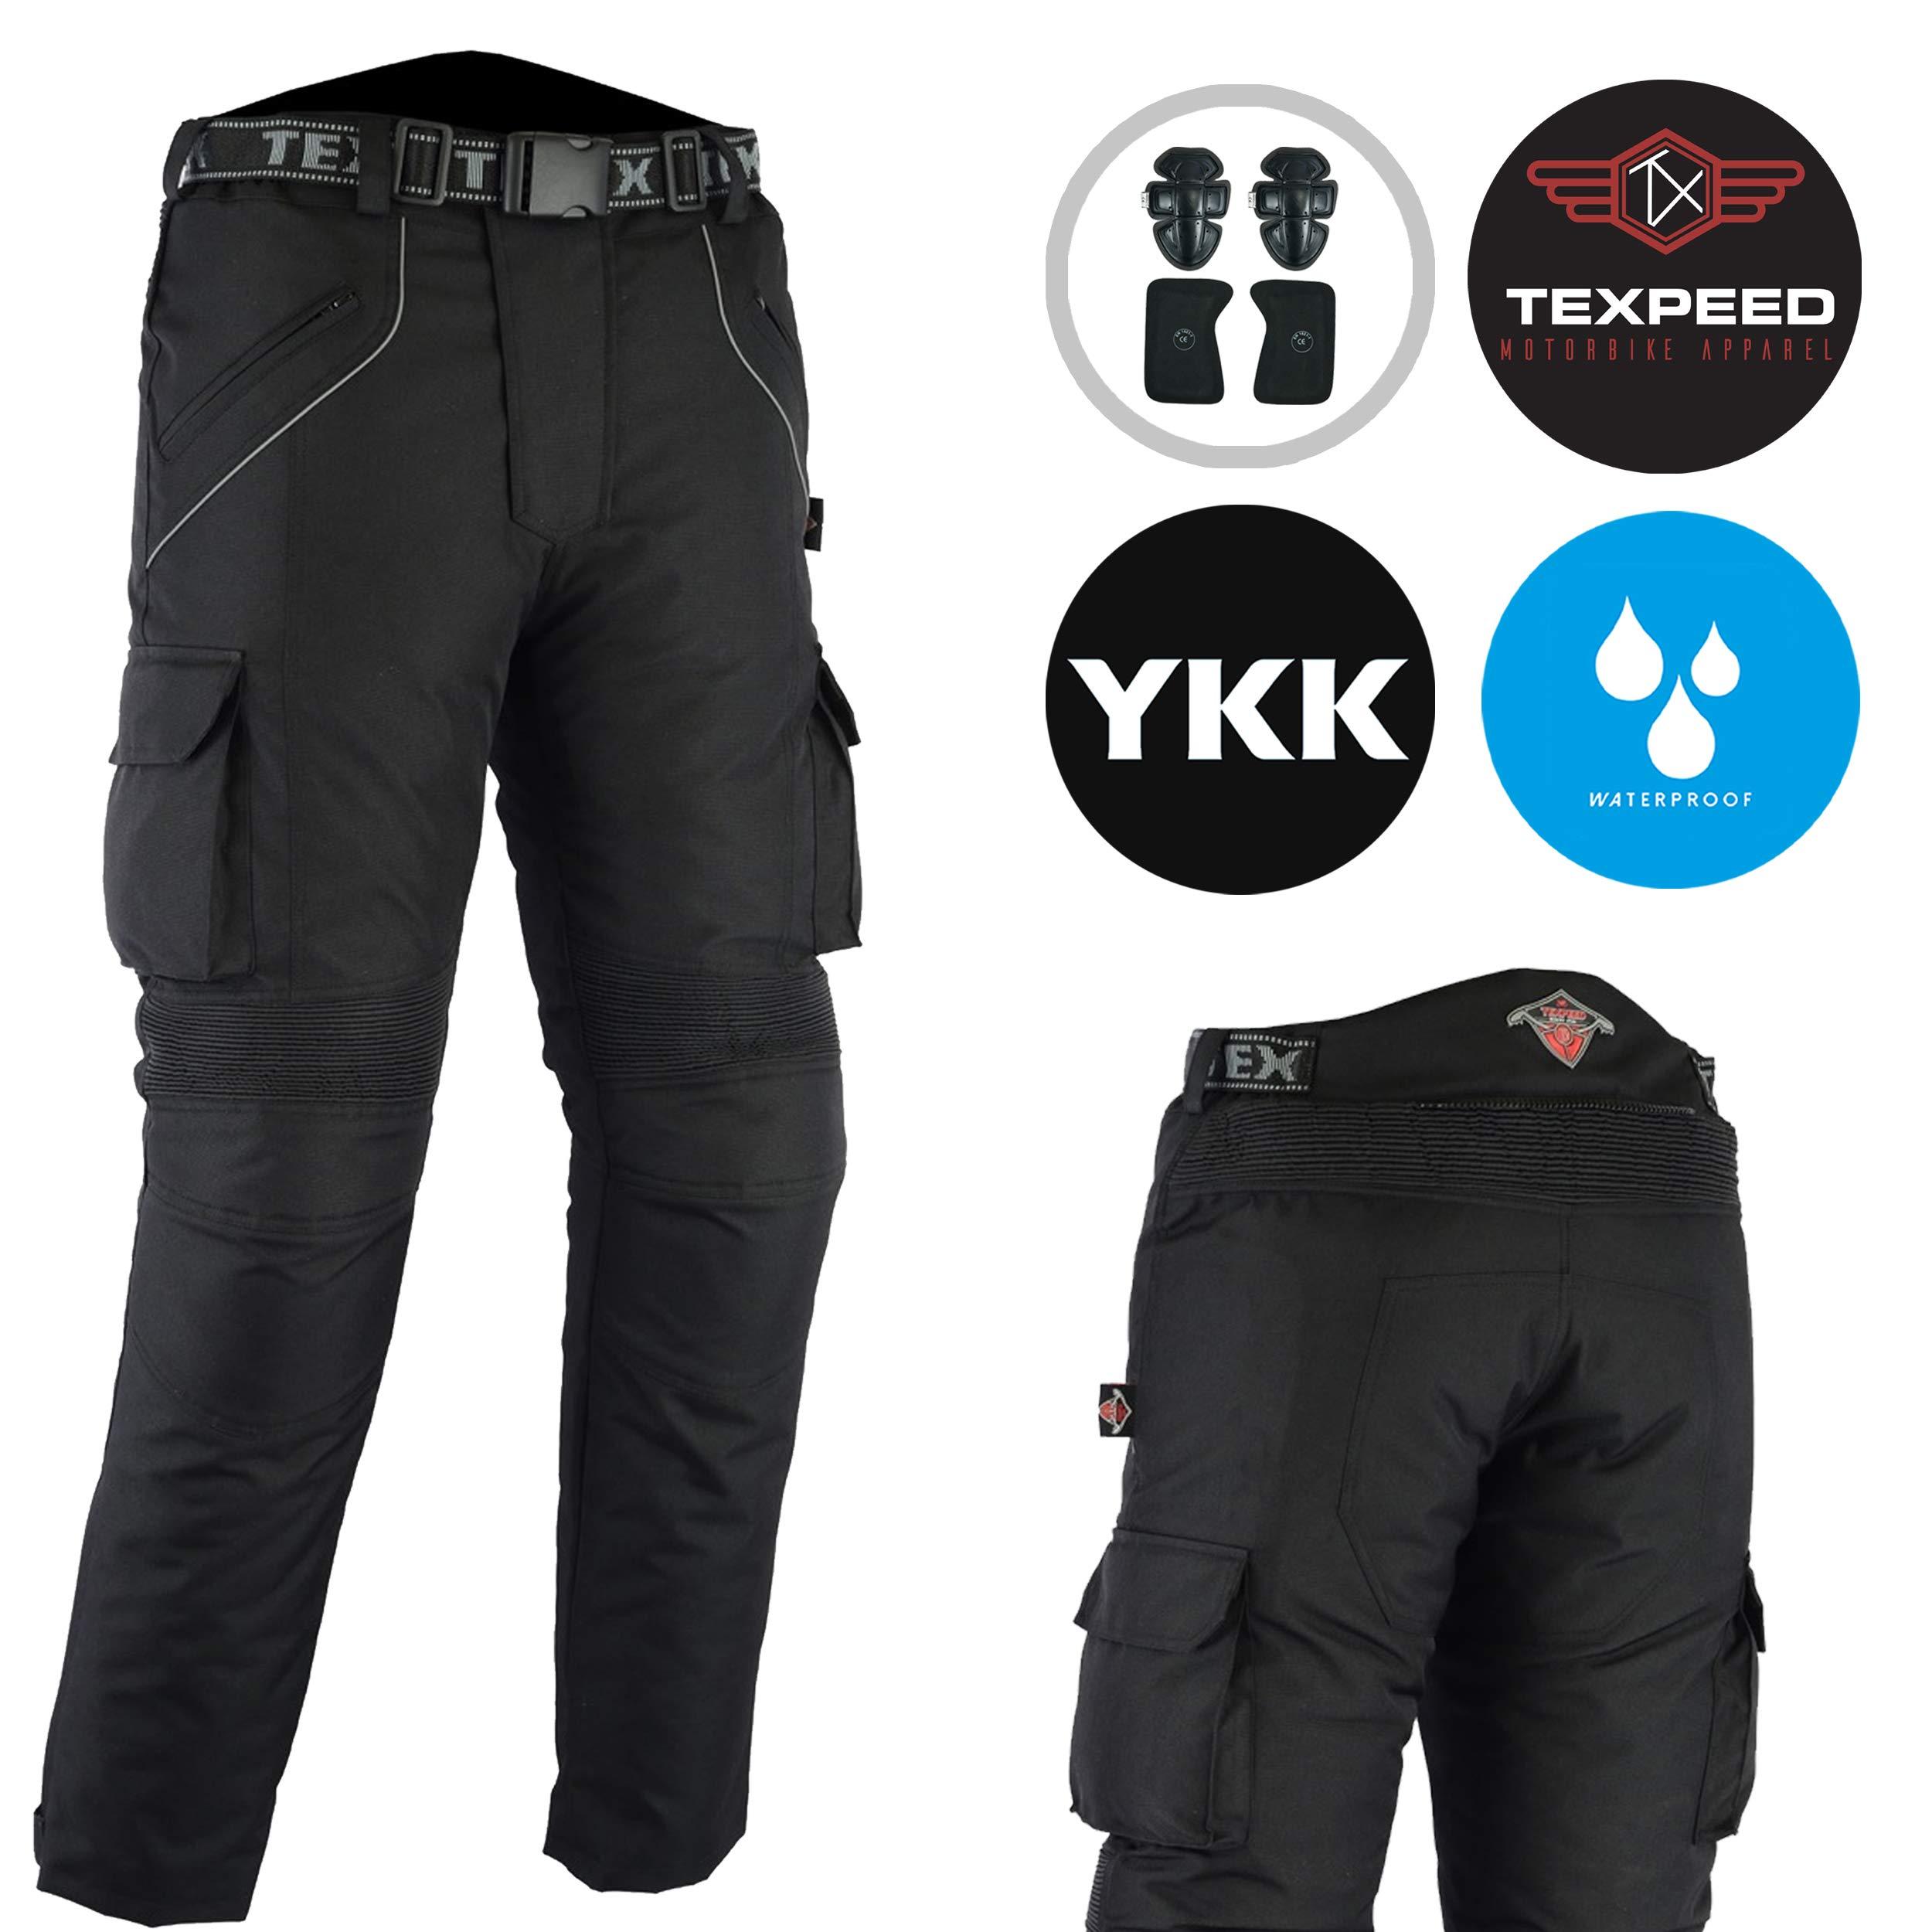 JET Motorcycle Motorbike Textile CE Armoured Waterproof Trousers Pants Zipper W44 L30, Black